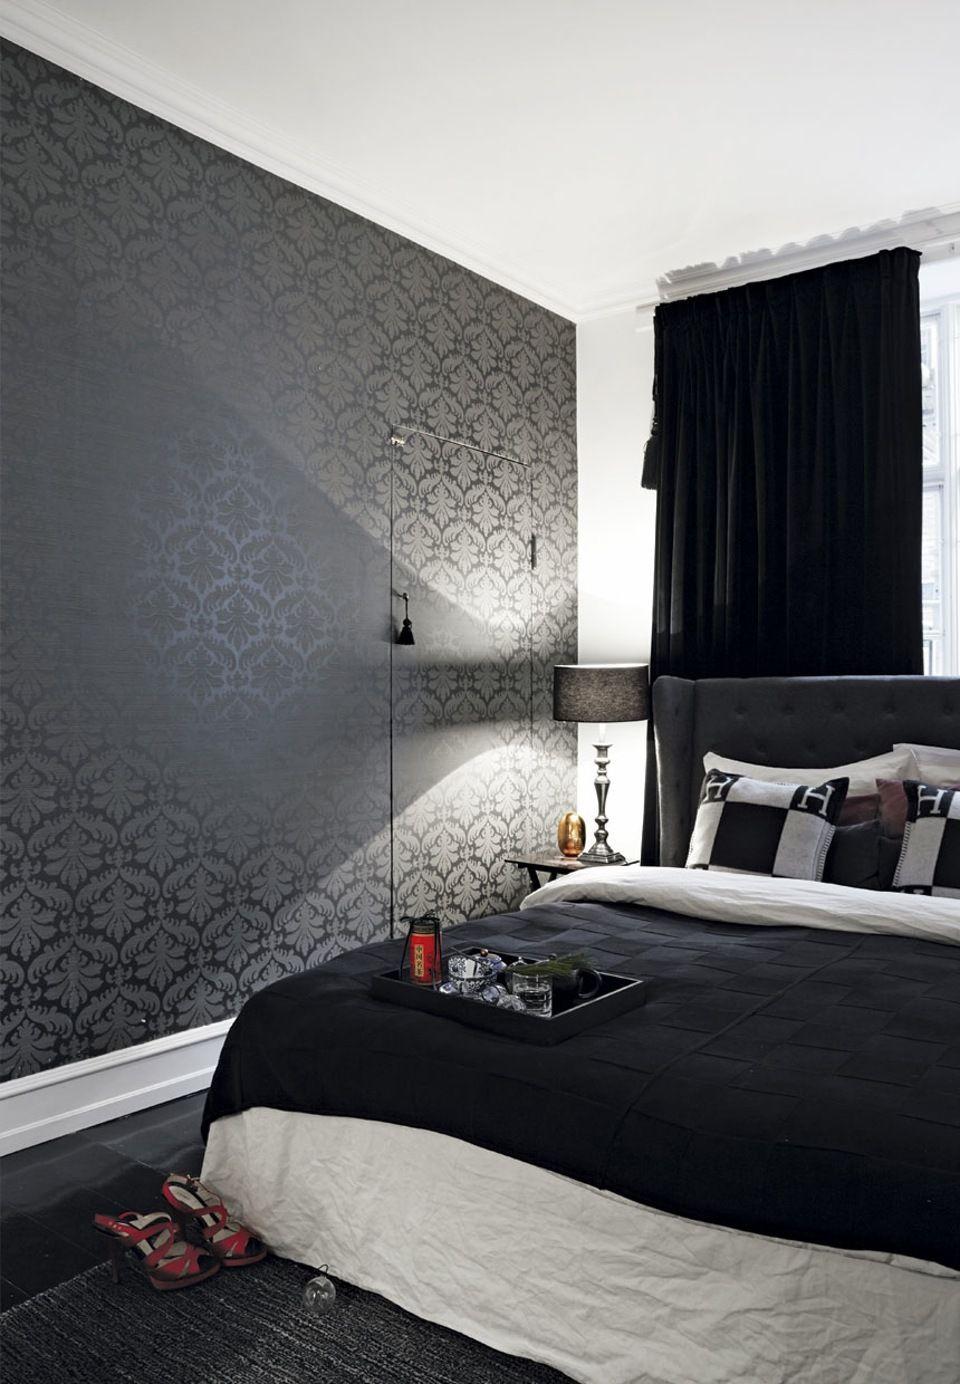 Modern bedroom with a Hstens bed elegant